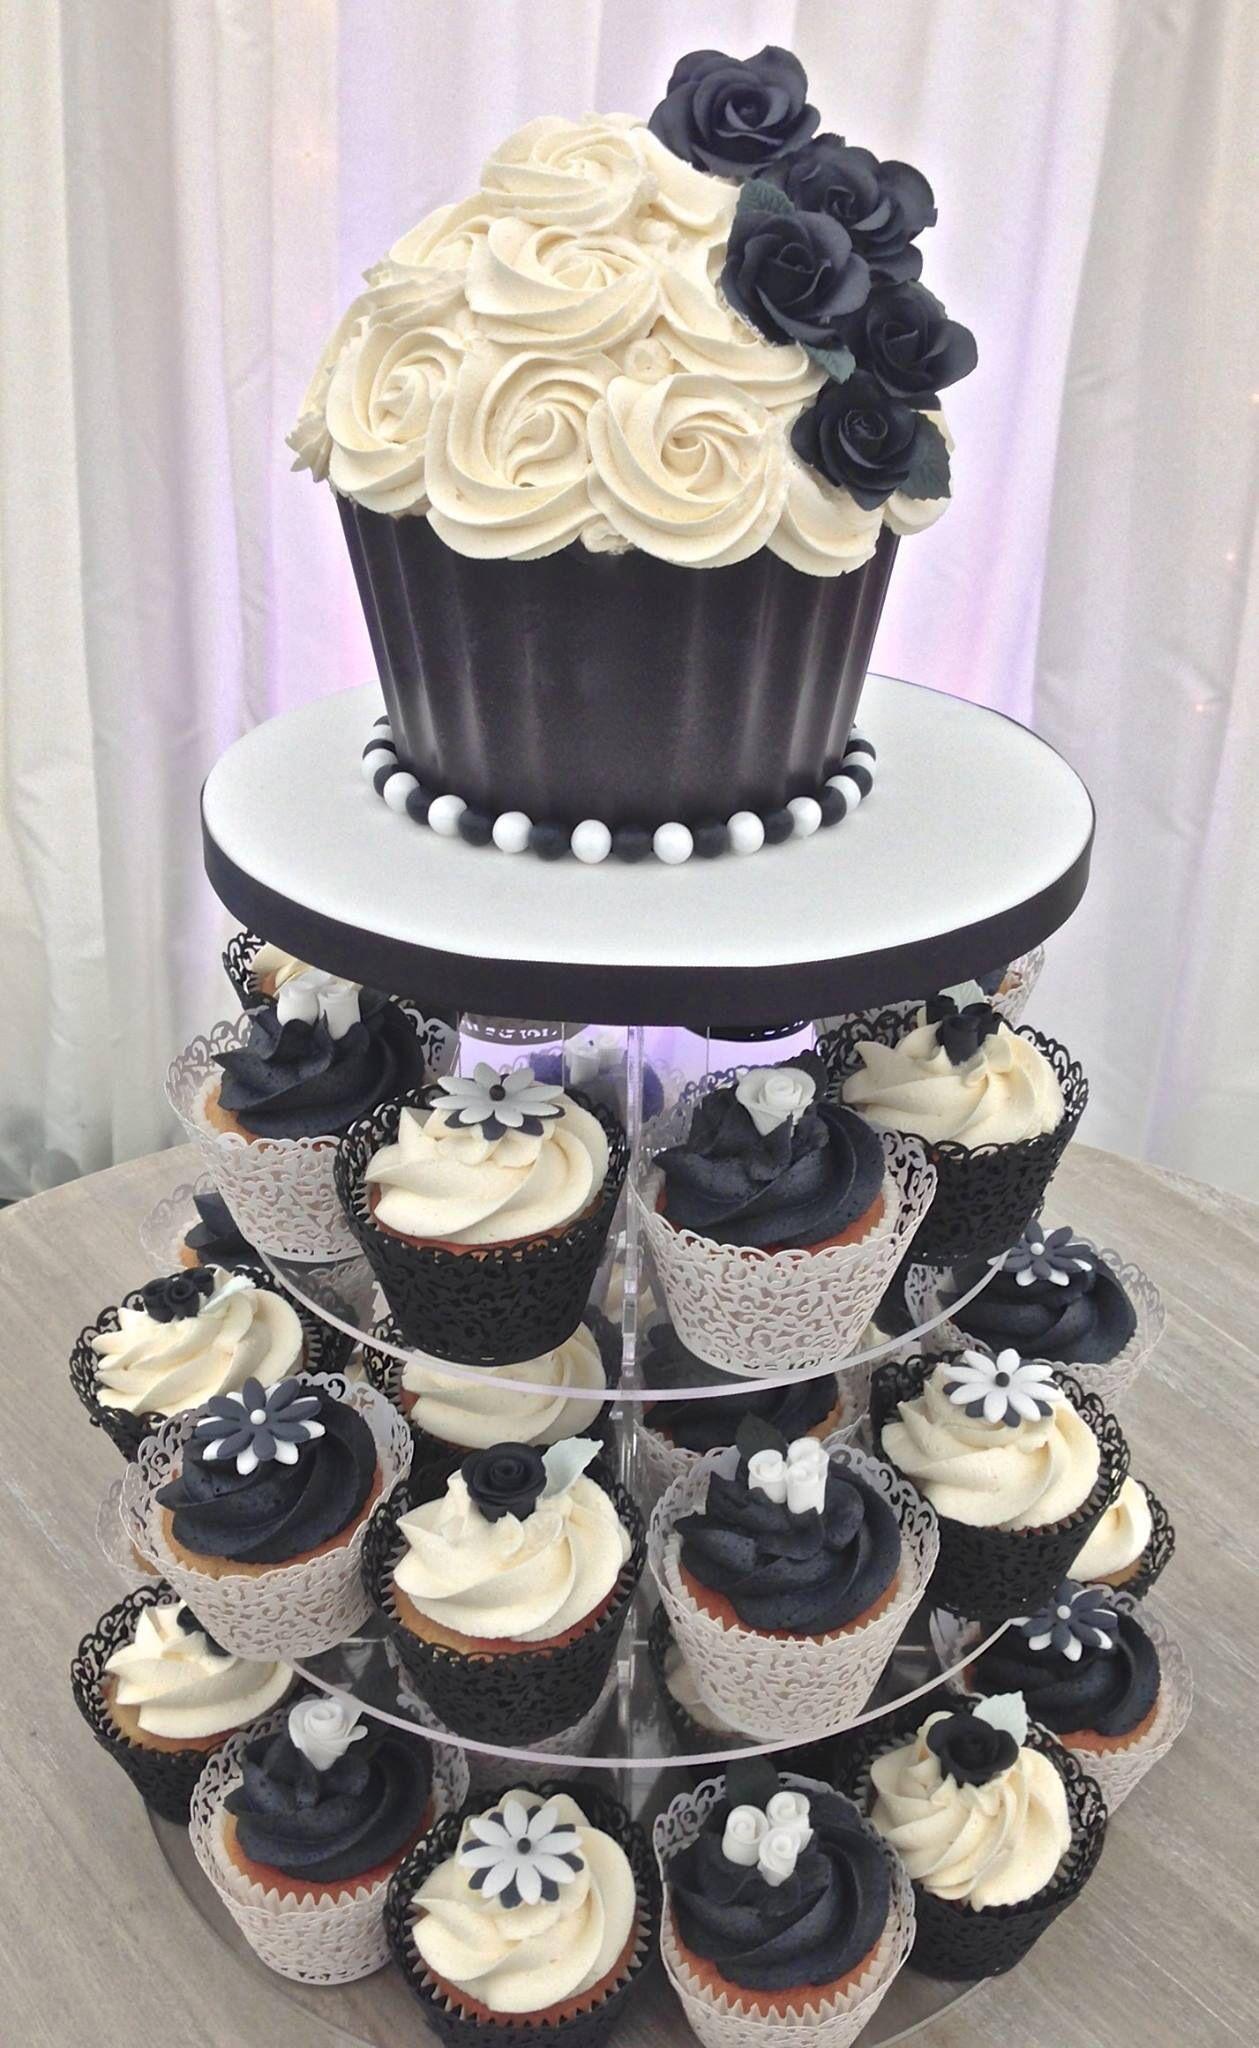 Black Amp White Wedding Cupcake Tower With Giant Cupcake Top